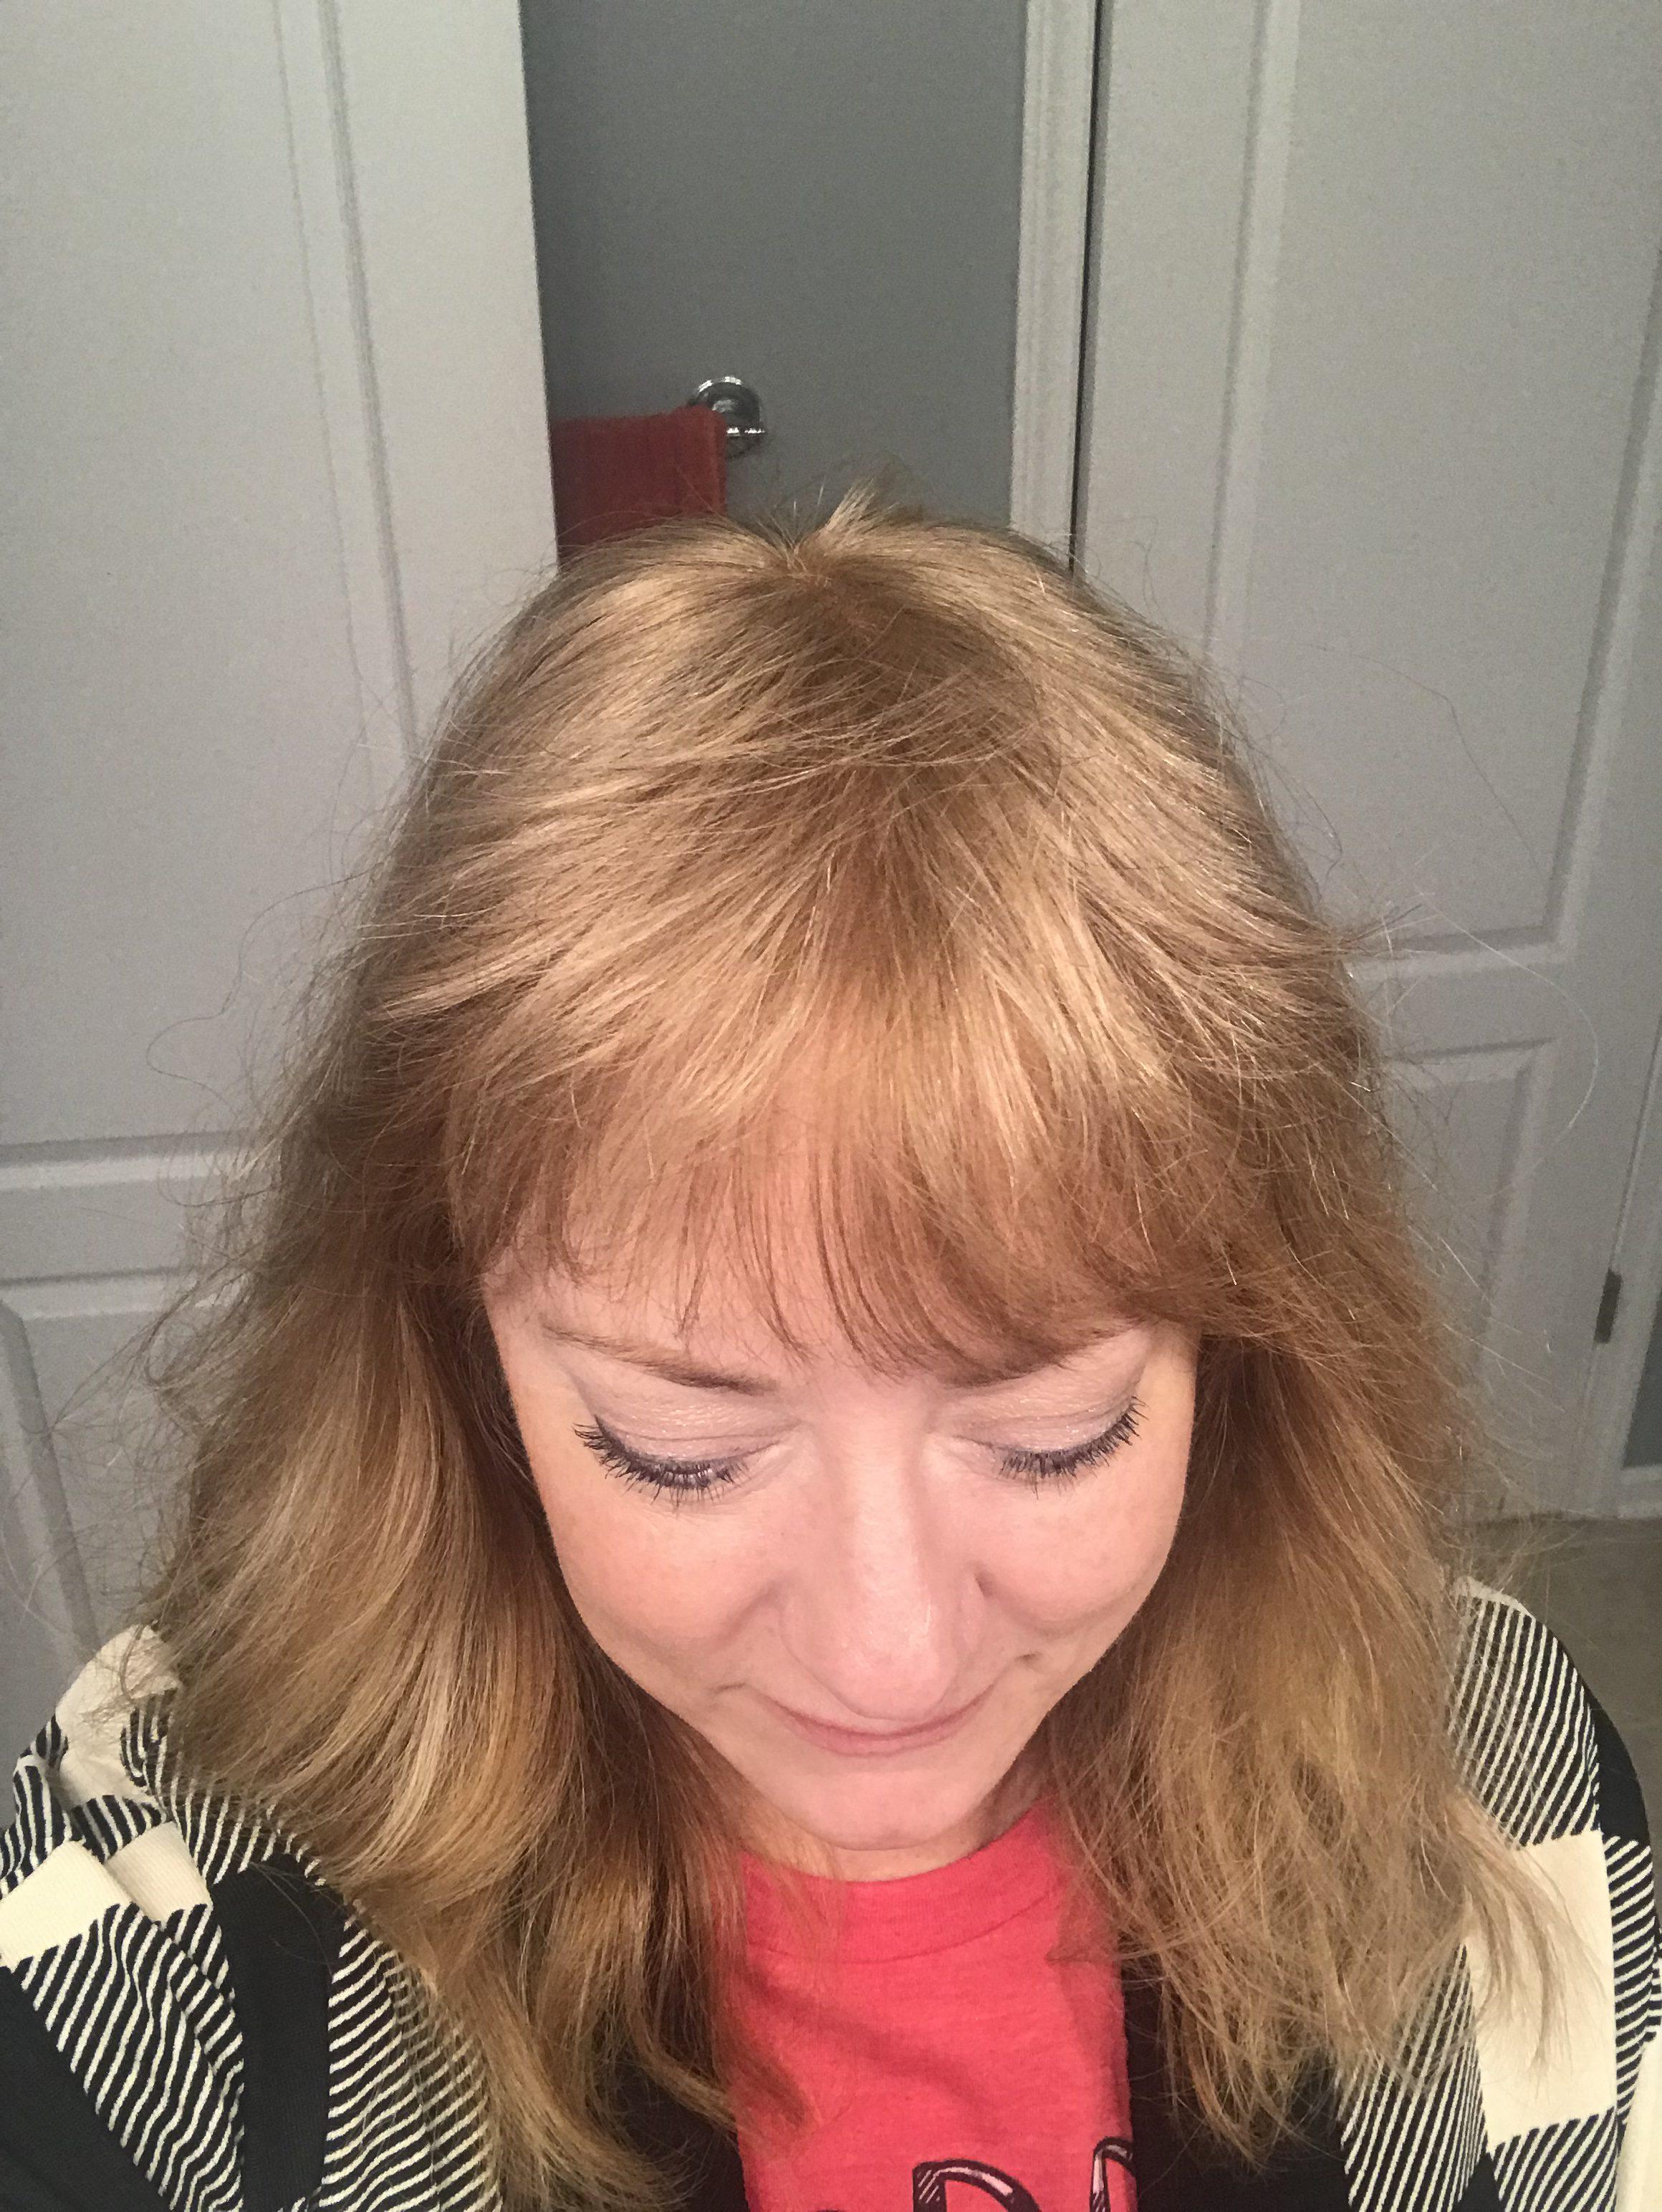 Hair topper hair loss women thin thinning hairpiece wig alopecia